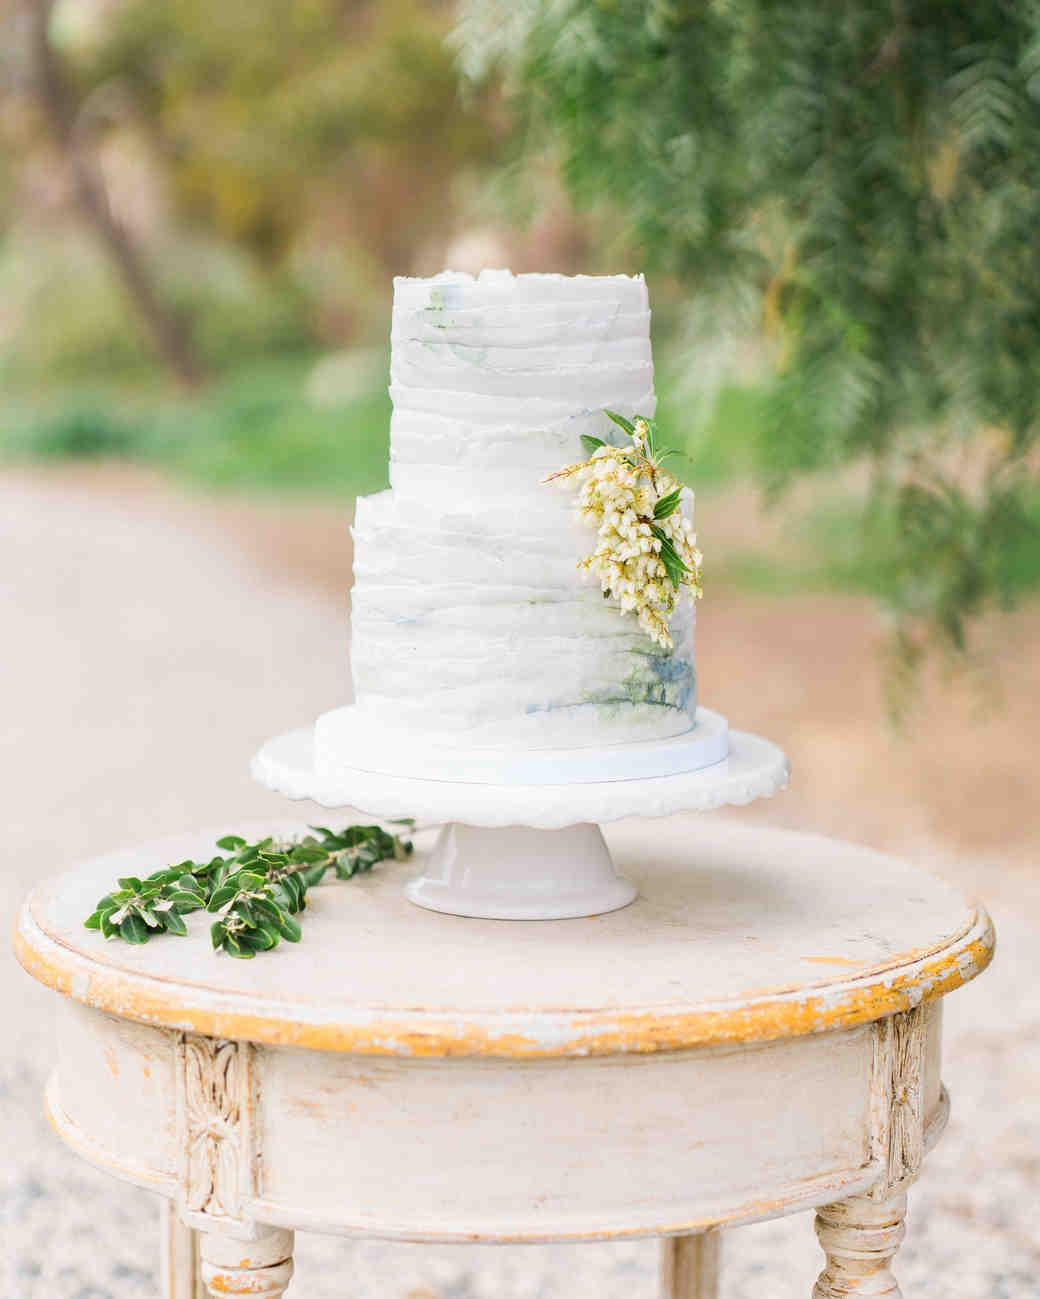 Gray and White Deckle-Edge Wedding Cake